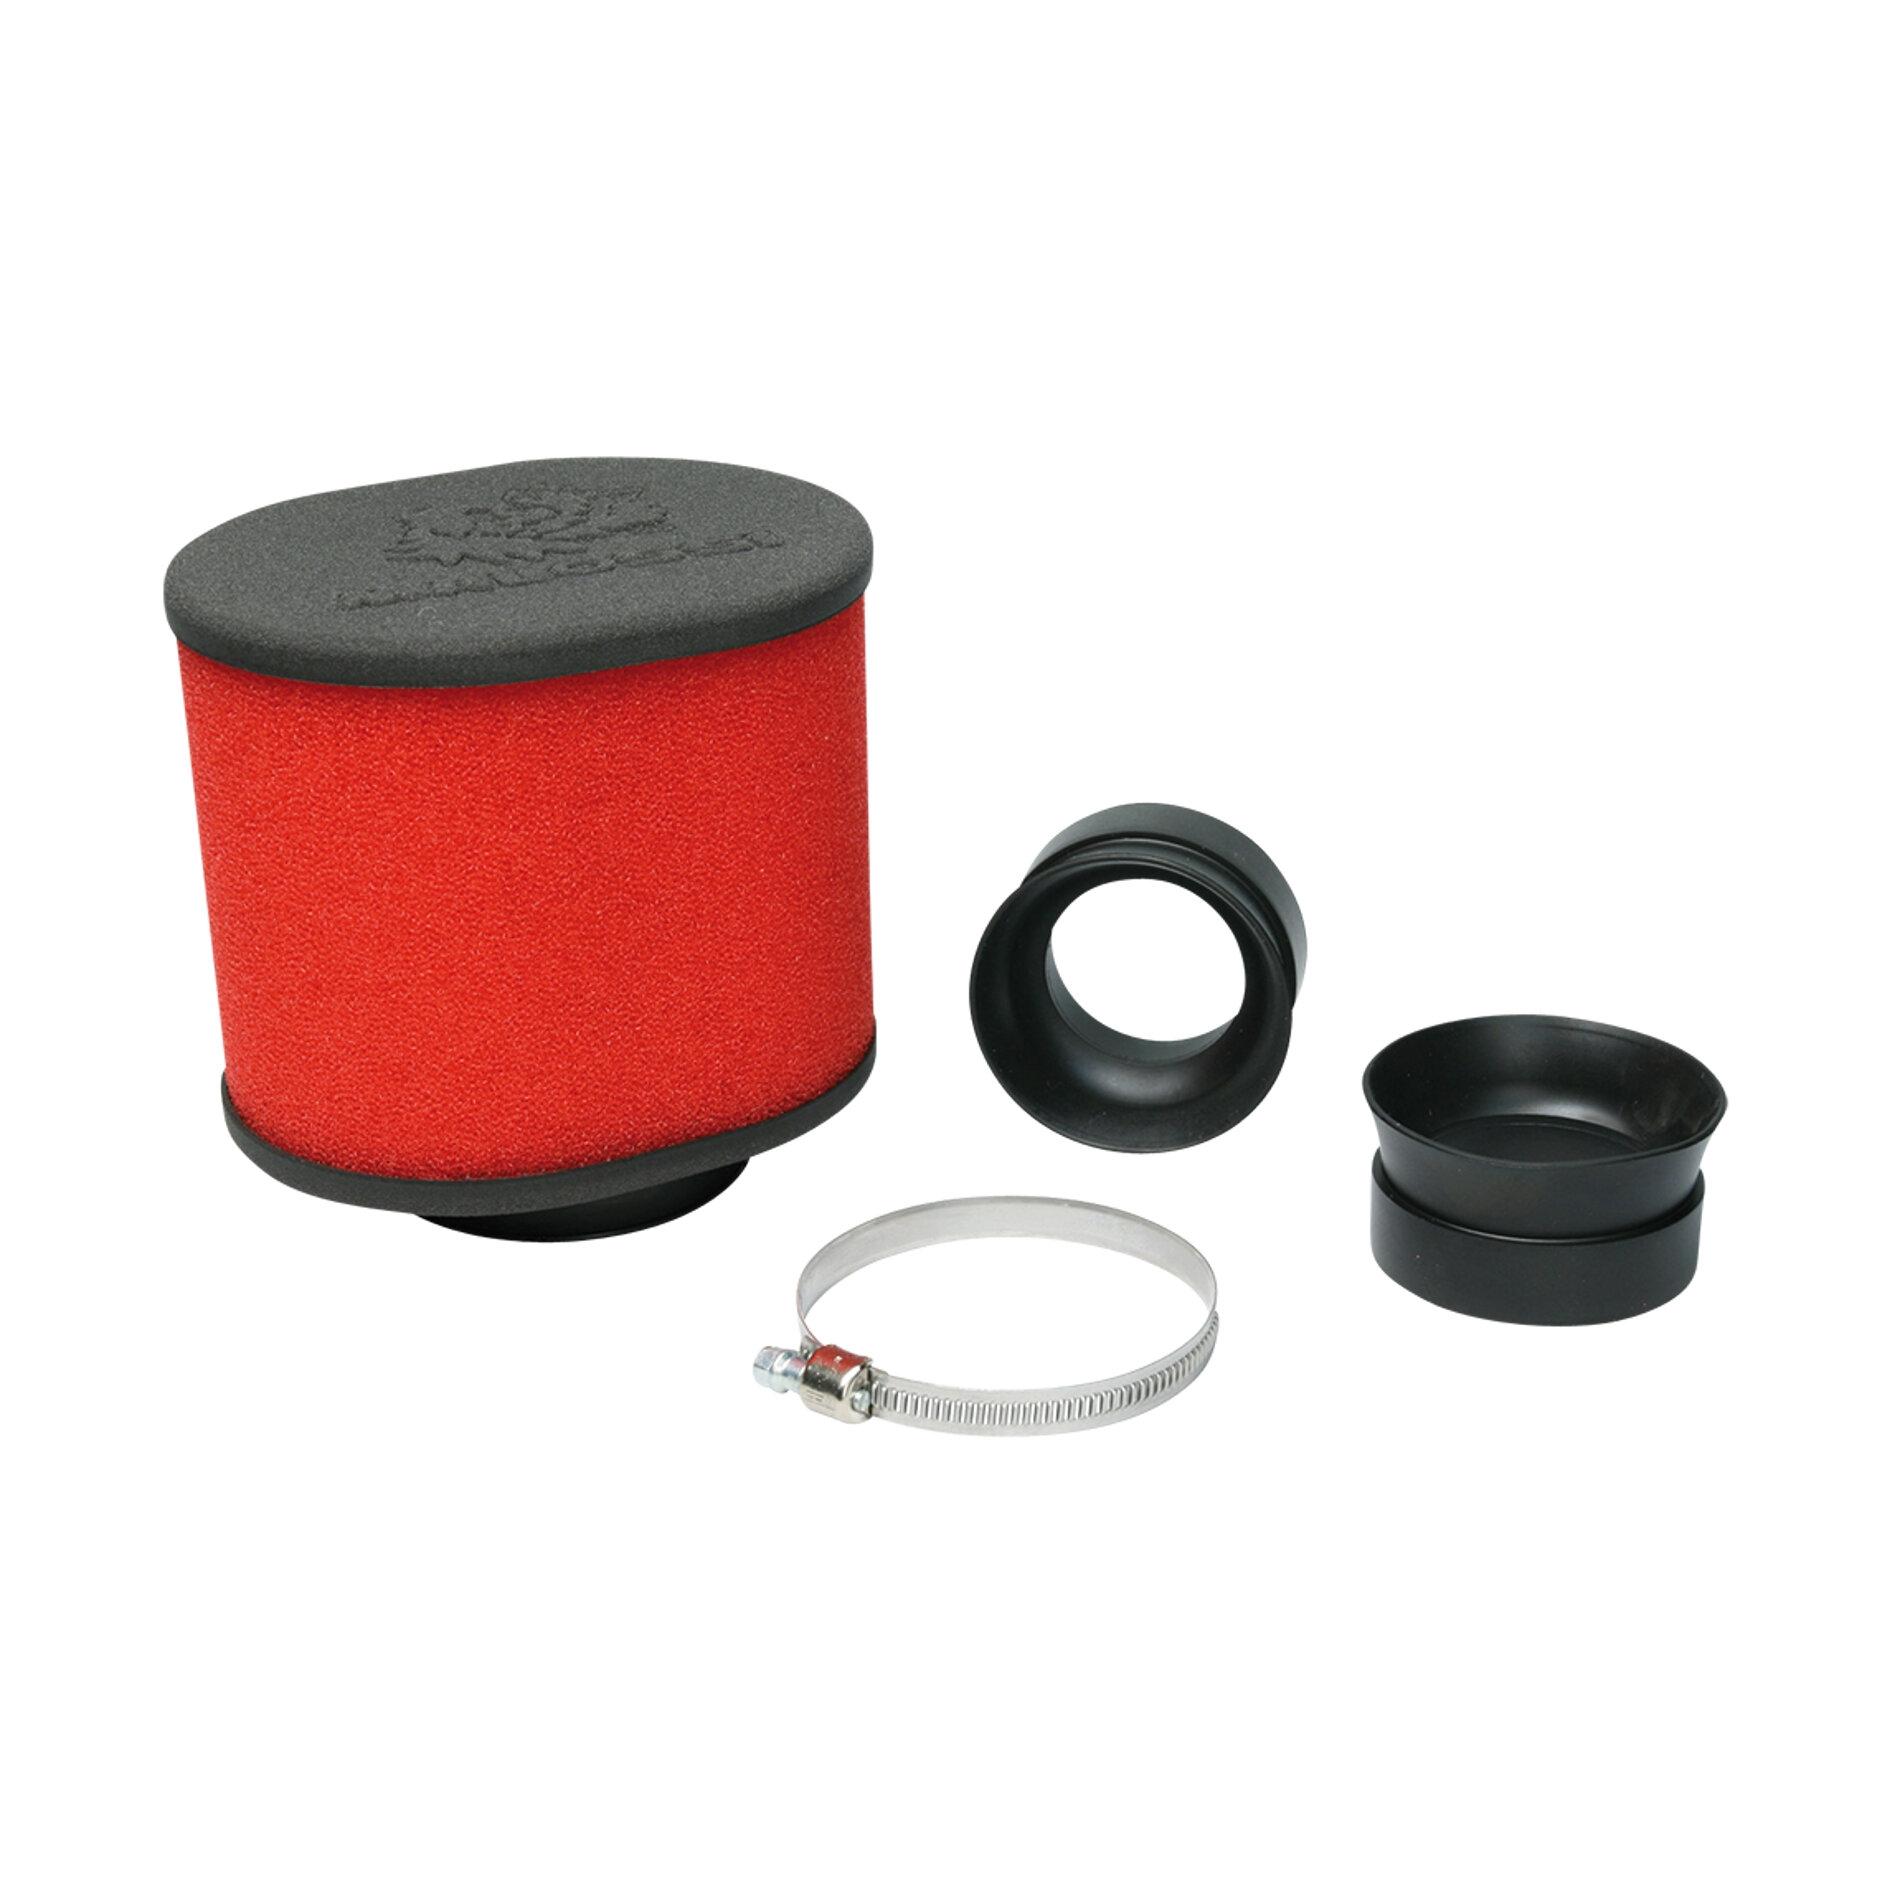 Filtre à air Malossi E15 Red Filter - 42 / 50 mm (adaptateurs)